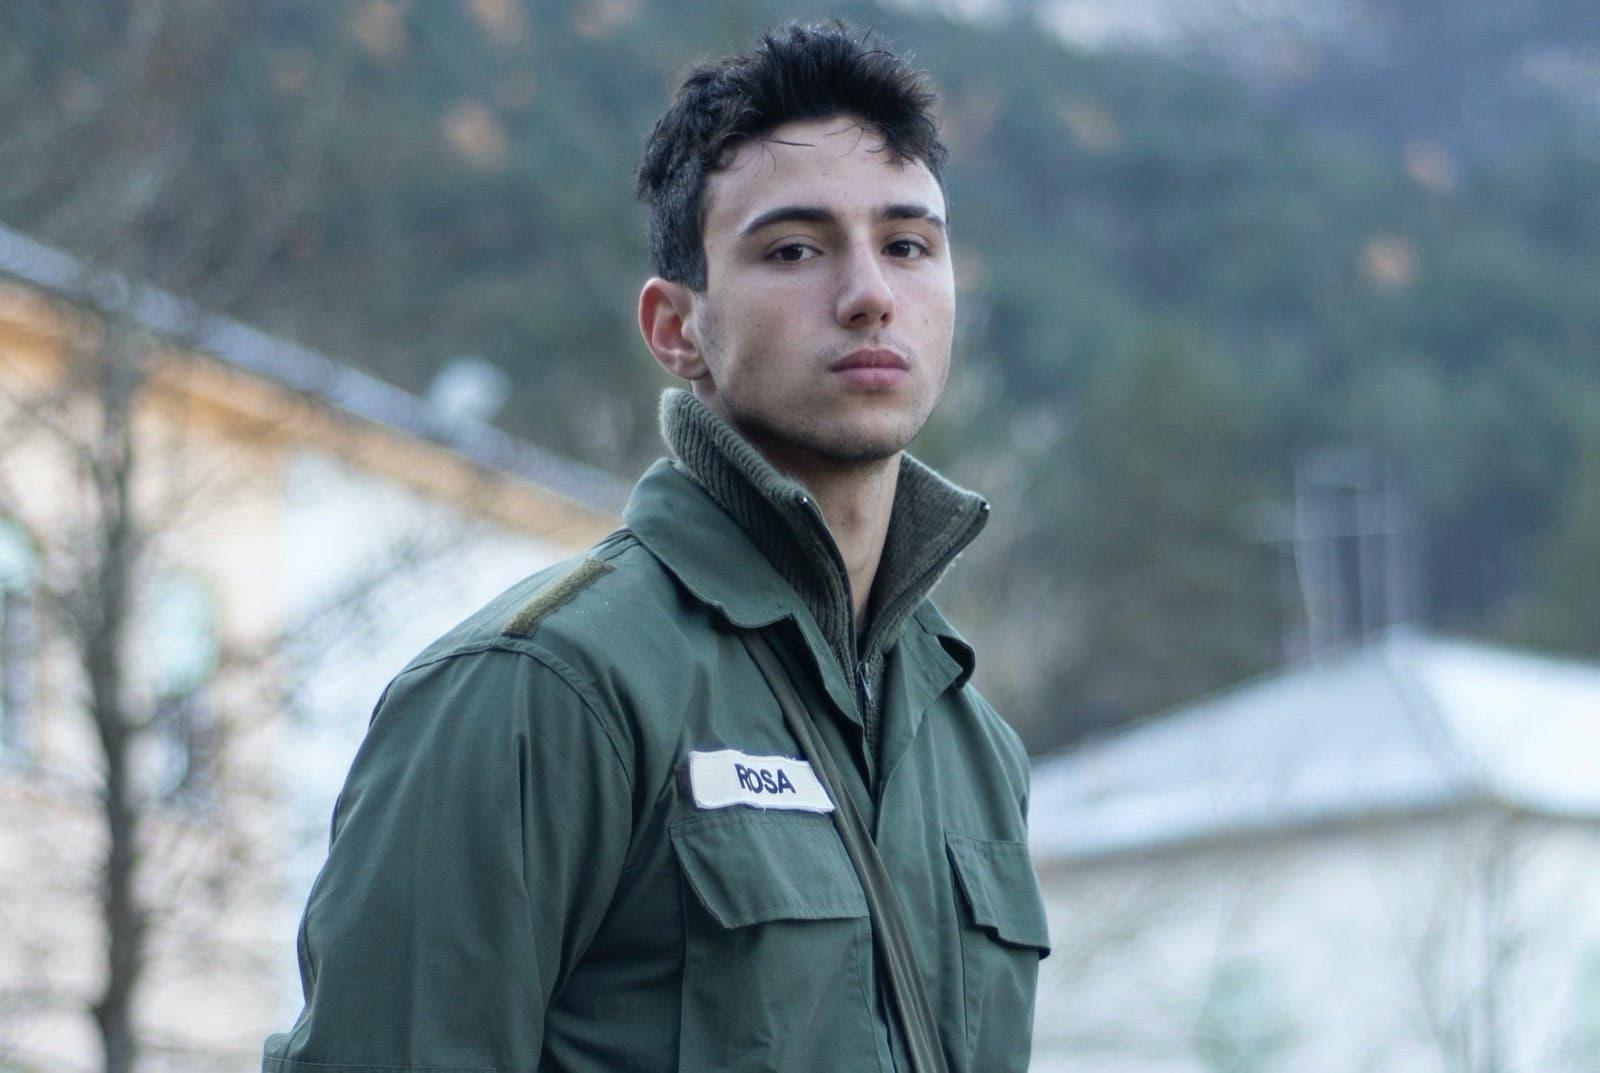 Andrea Antonio Rosa